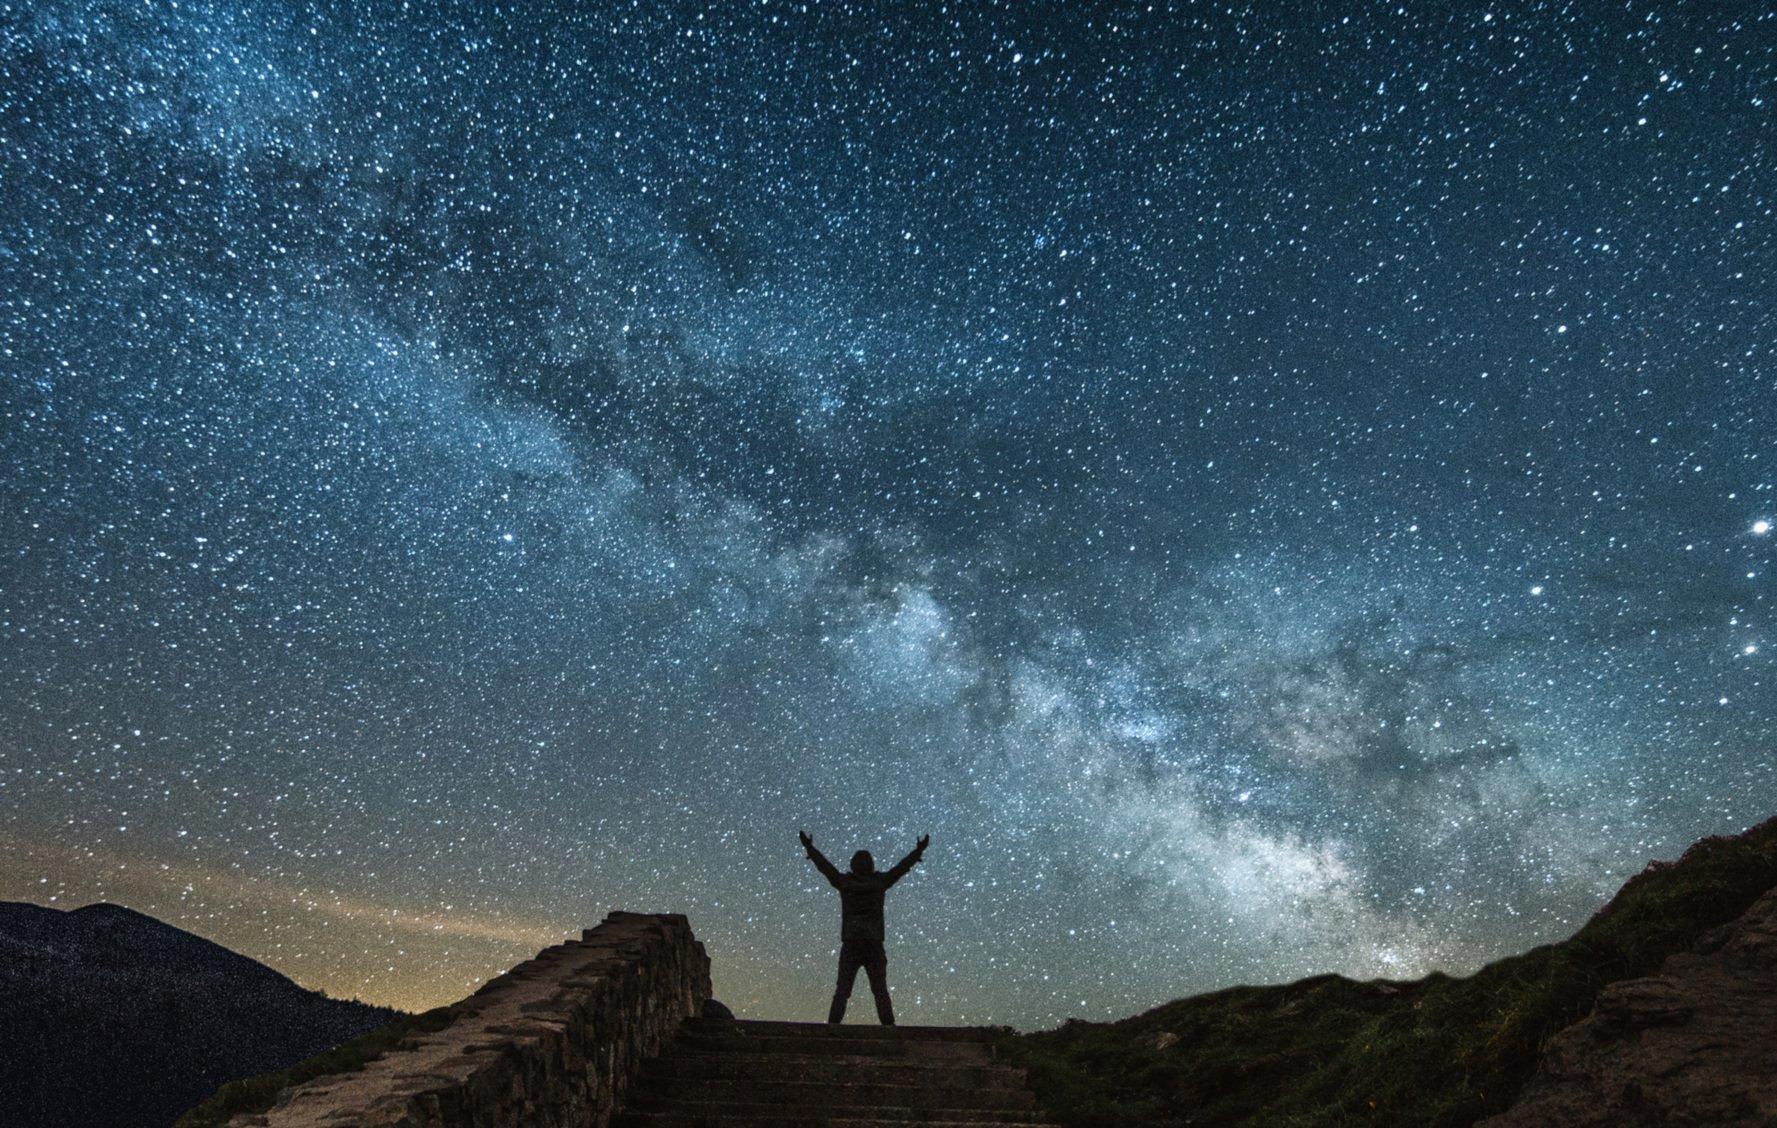 Astronomie Der wilde Kosmos im Blick - wissenschaft.de